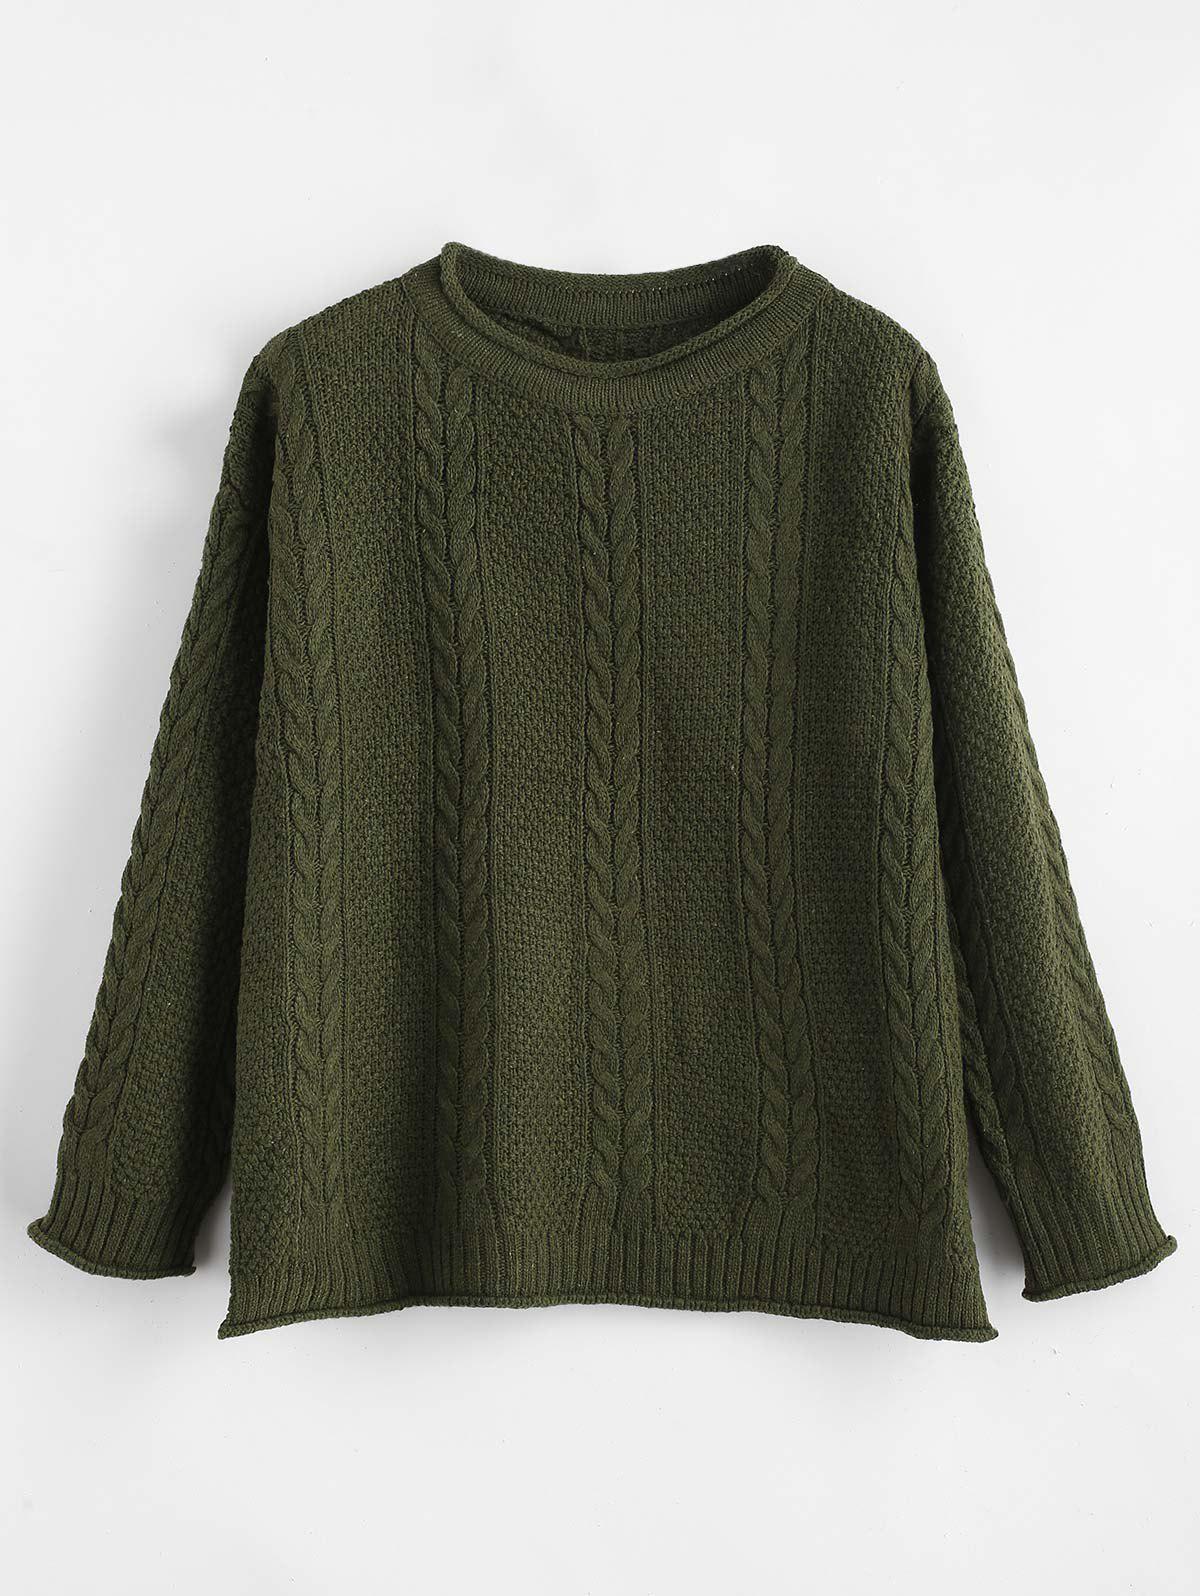 Slit Cable Knit Drop Shoulder Sweater